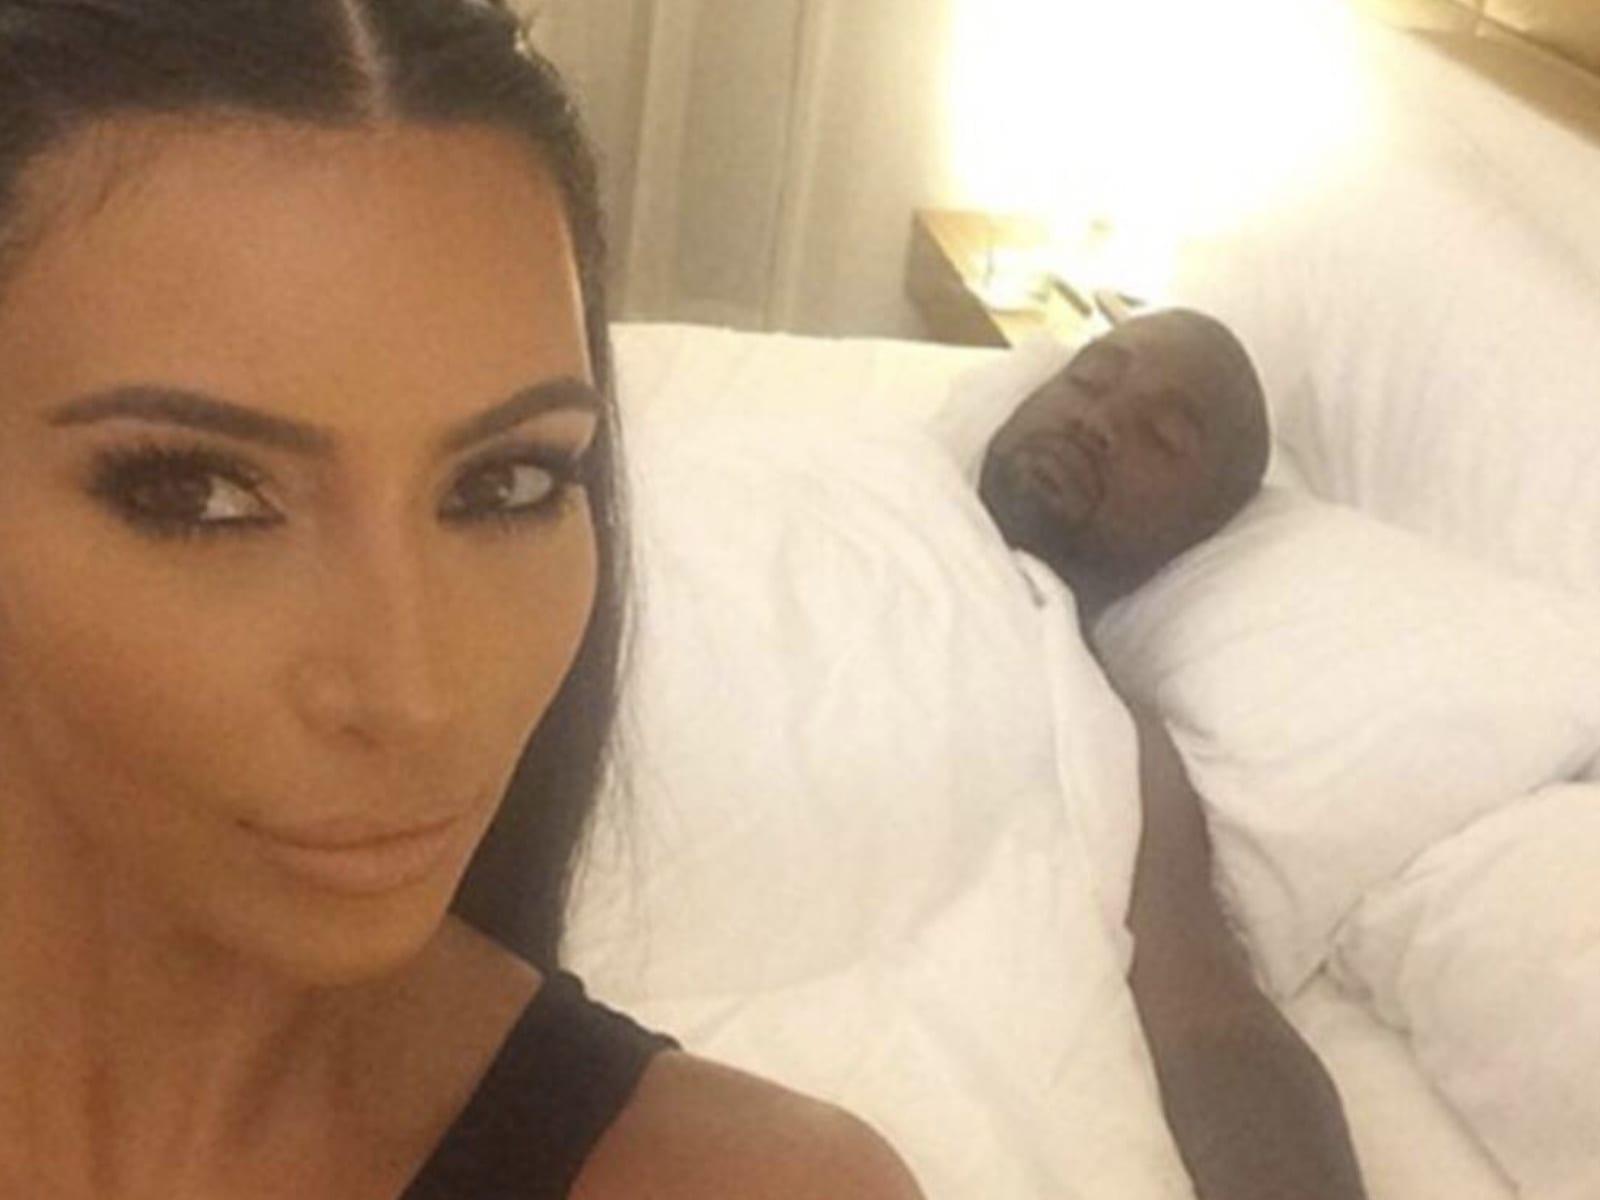 Kanye West + Kim Kardashian Extreme Dating Rumors Emerge After Divorce Reports